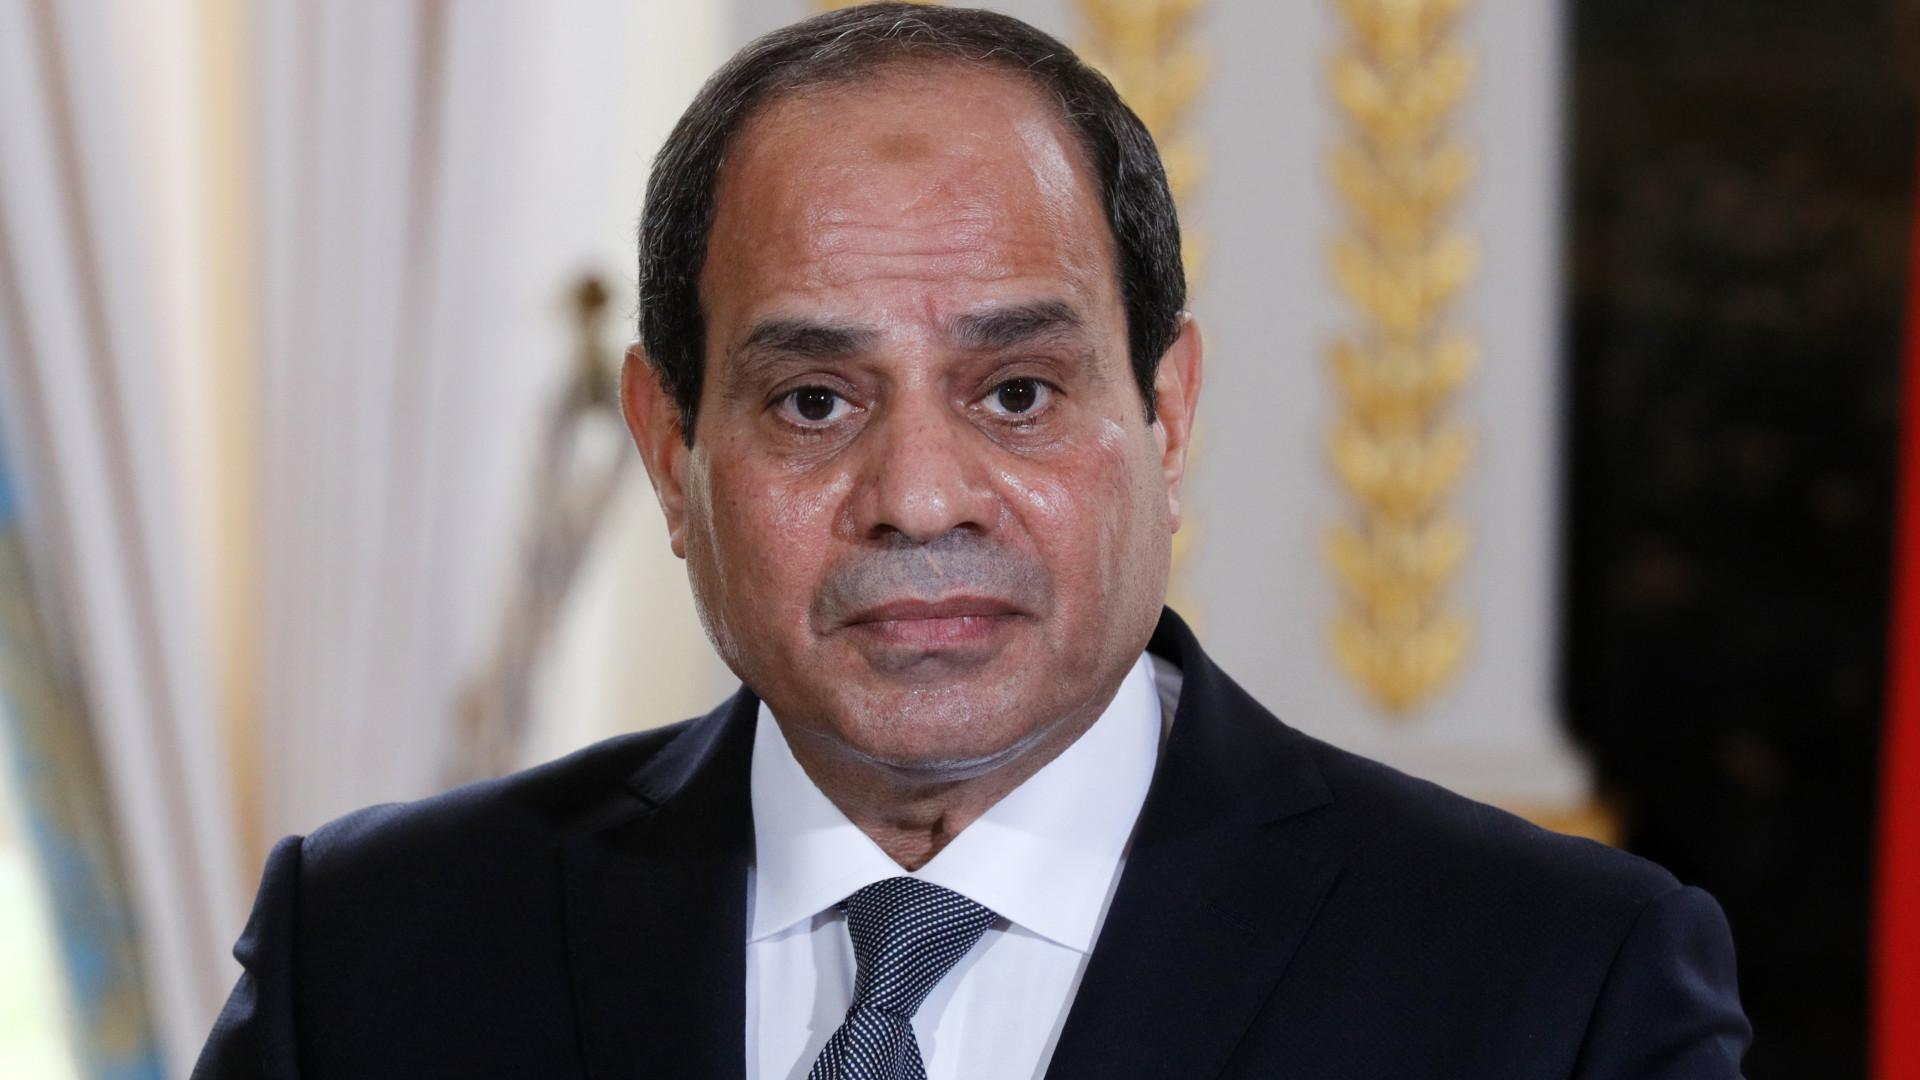 Abdel Fattah al-Sisi vai recandidatar-se à presidência do Egipto